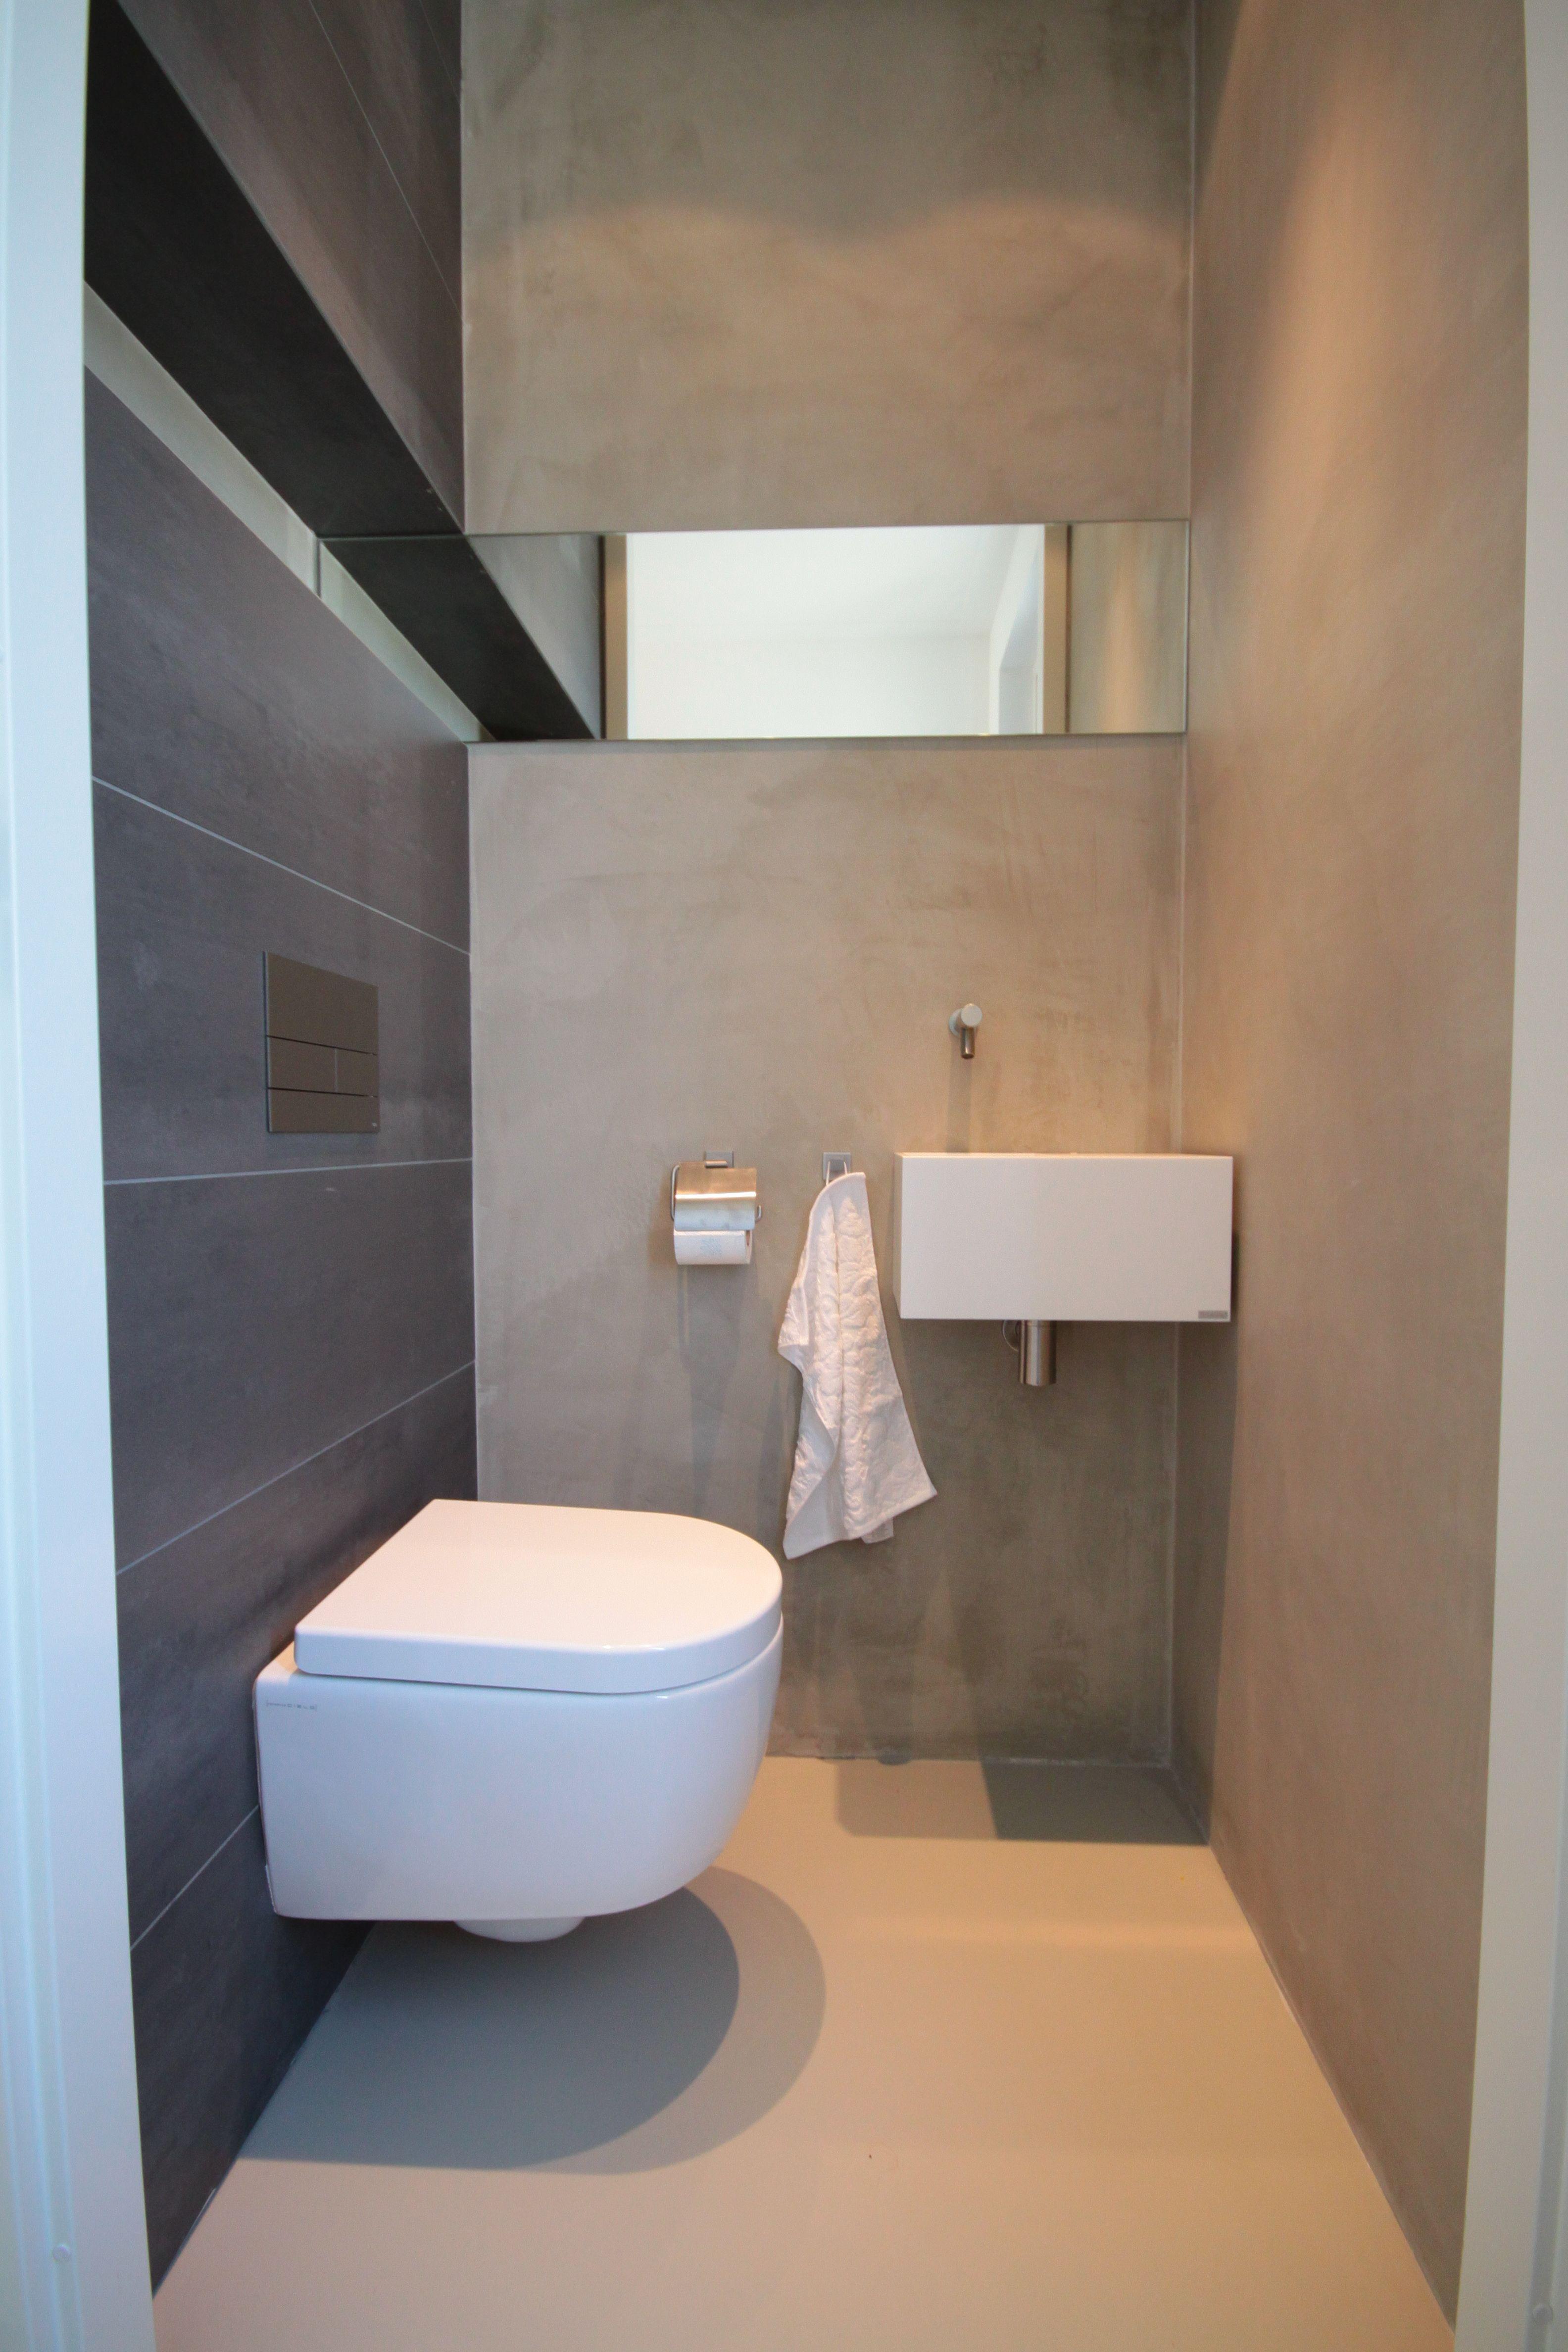 Pin Van Michael Konig Op Pdb Verbouwingen Met Oog Voor Detail Toiletruimte Badkamer Badkamer Ontwerp